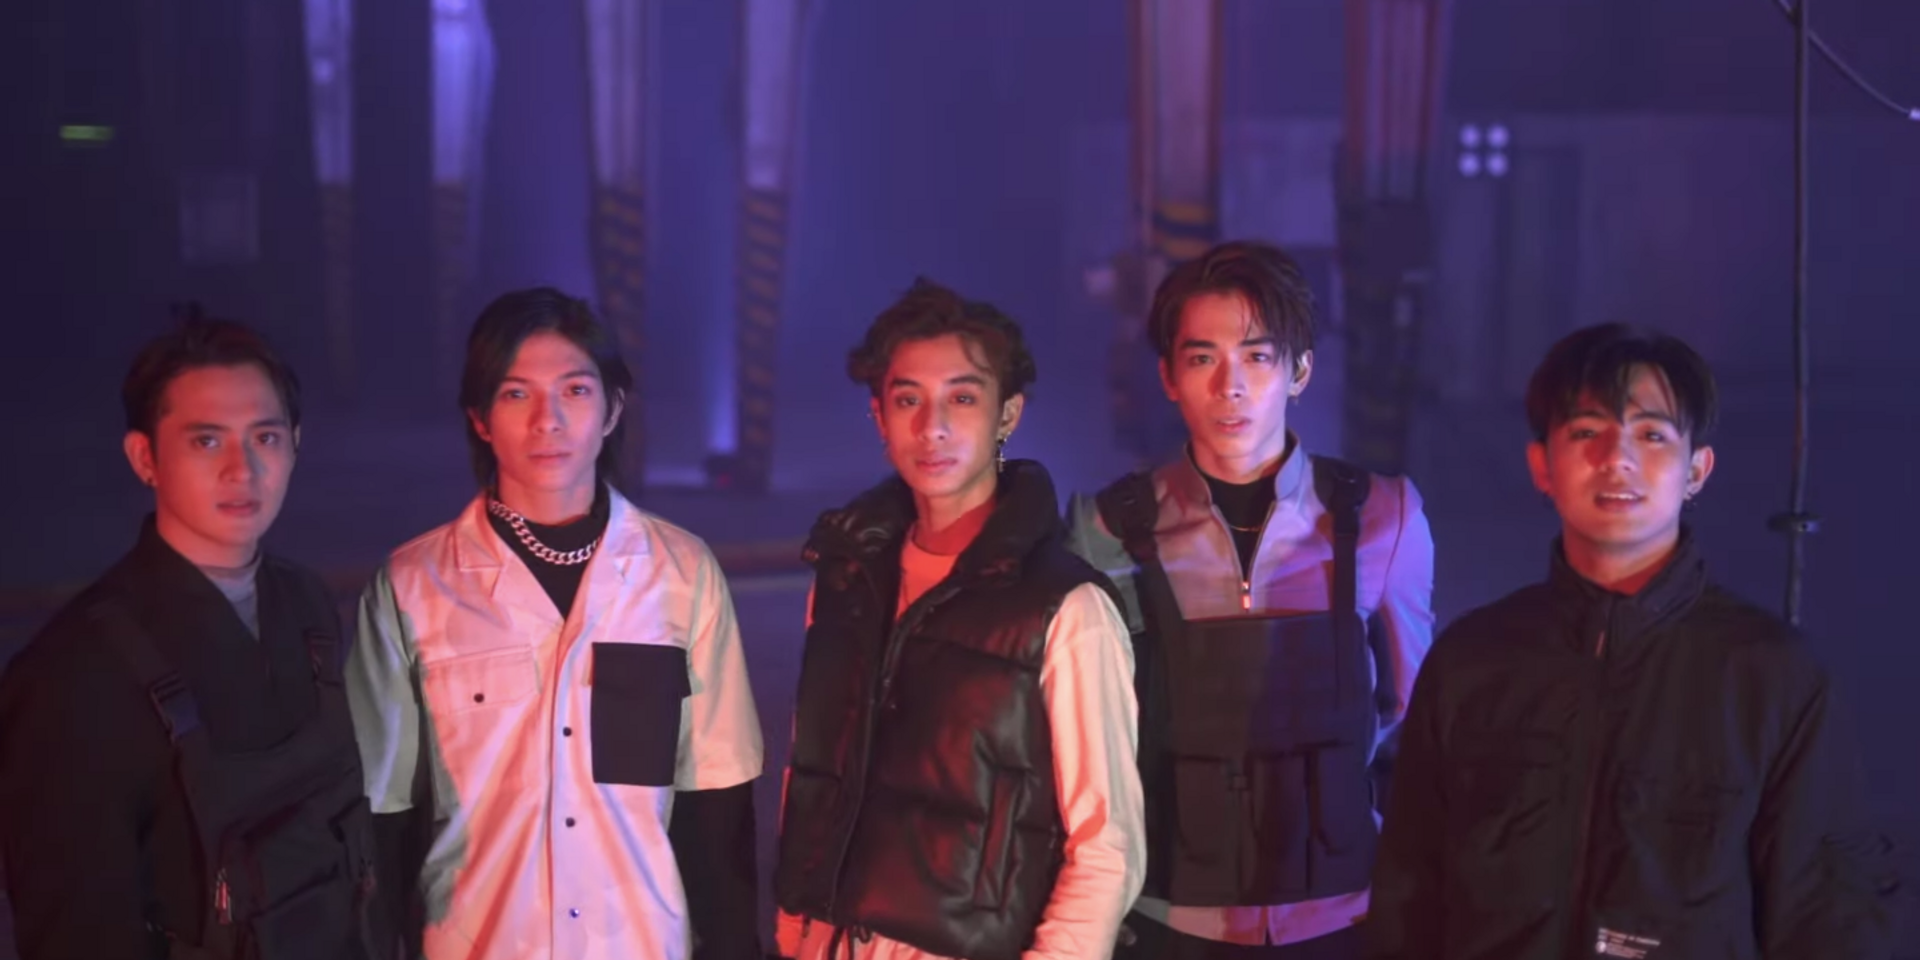 BGYO return with new single 'The Baddest' – listen